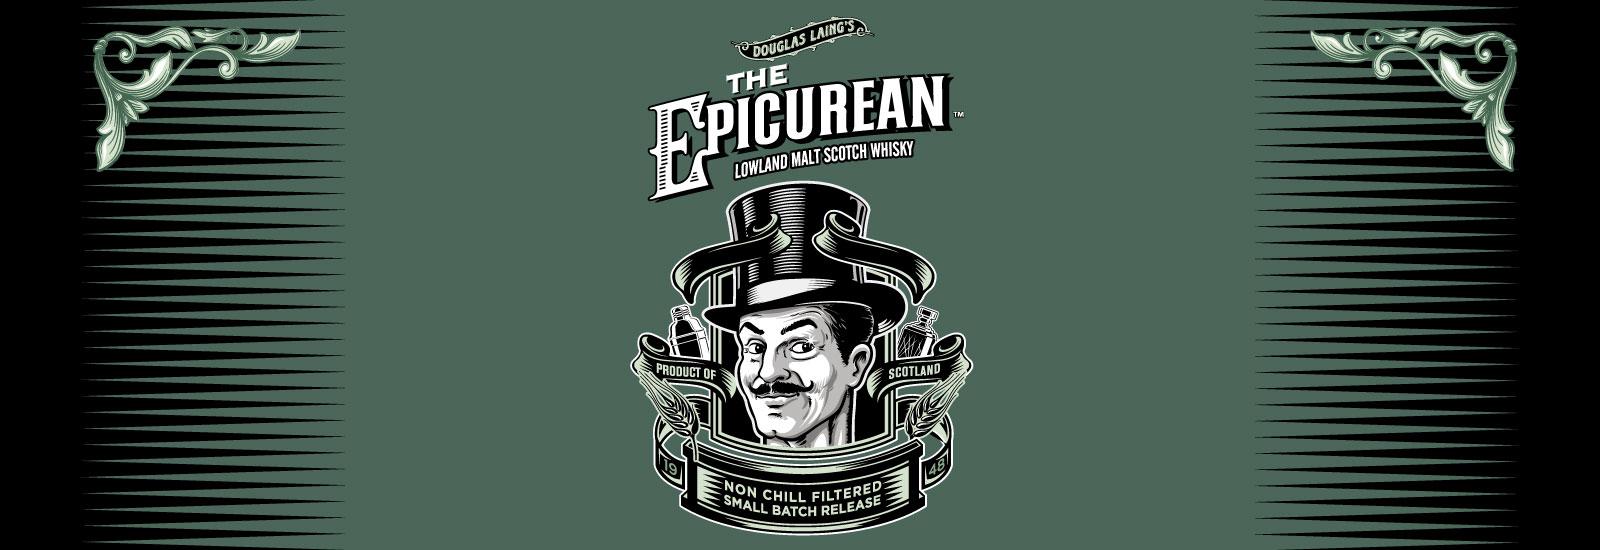 The Epicurean Lowland Malt Whisky